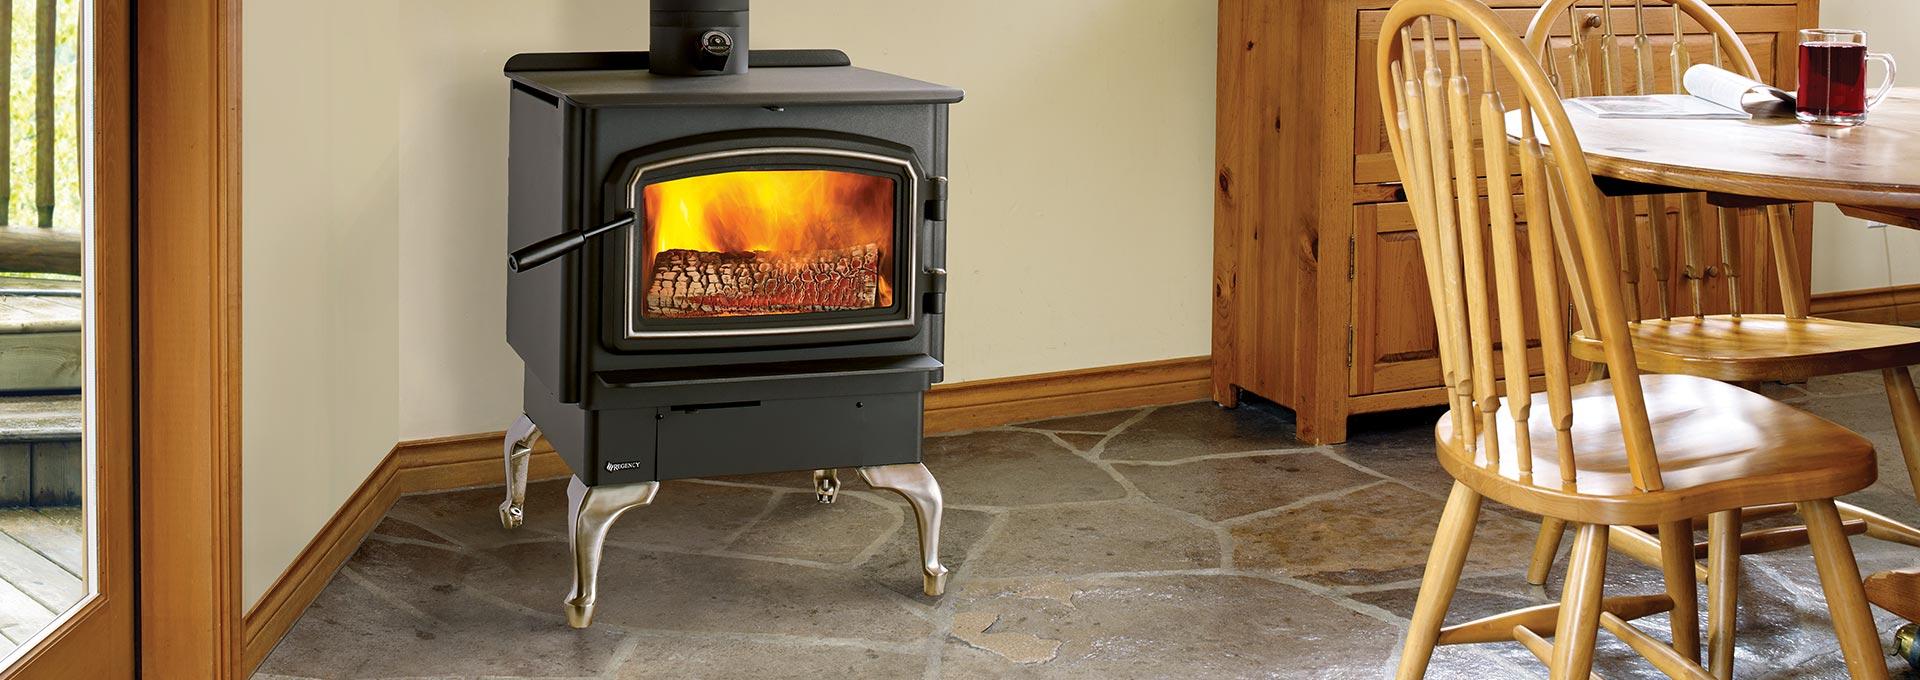 California Wood Burning Fireplace Law 2018 Lovely Wood Stoves